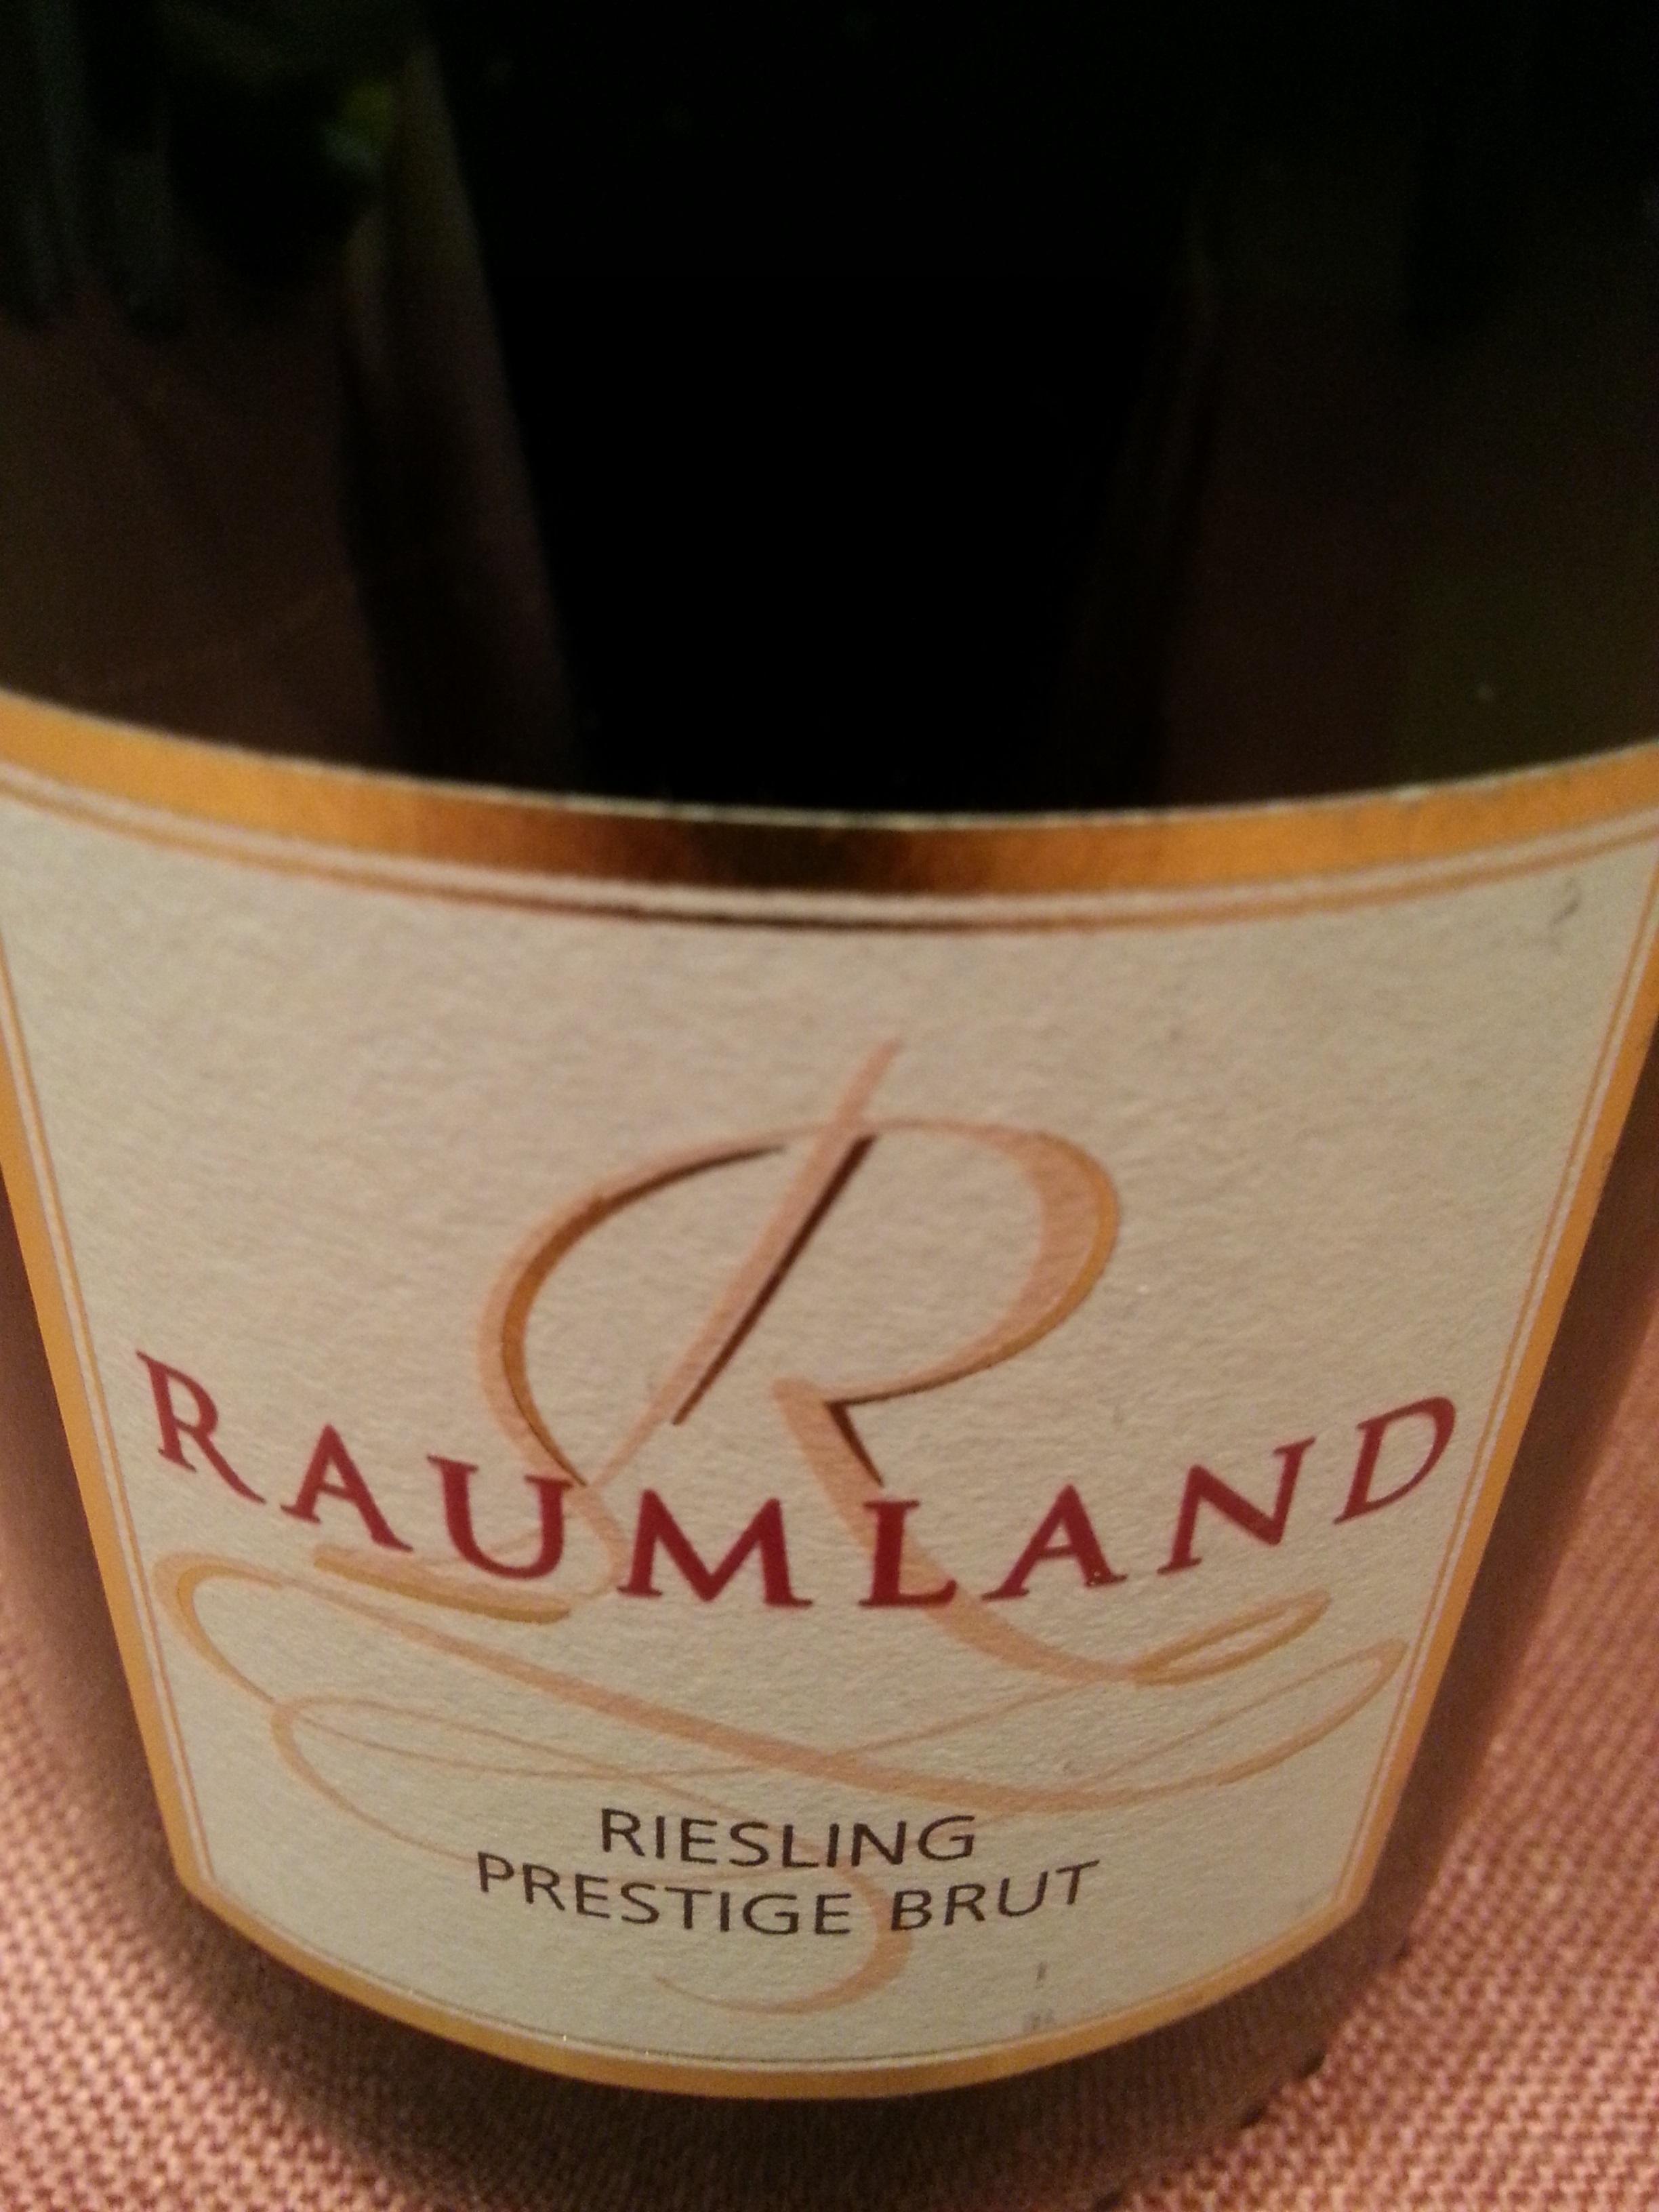 -nv- Riesling Prestige brut   Raumland